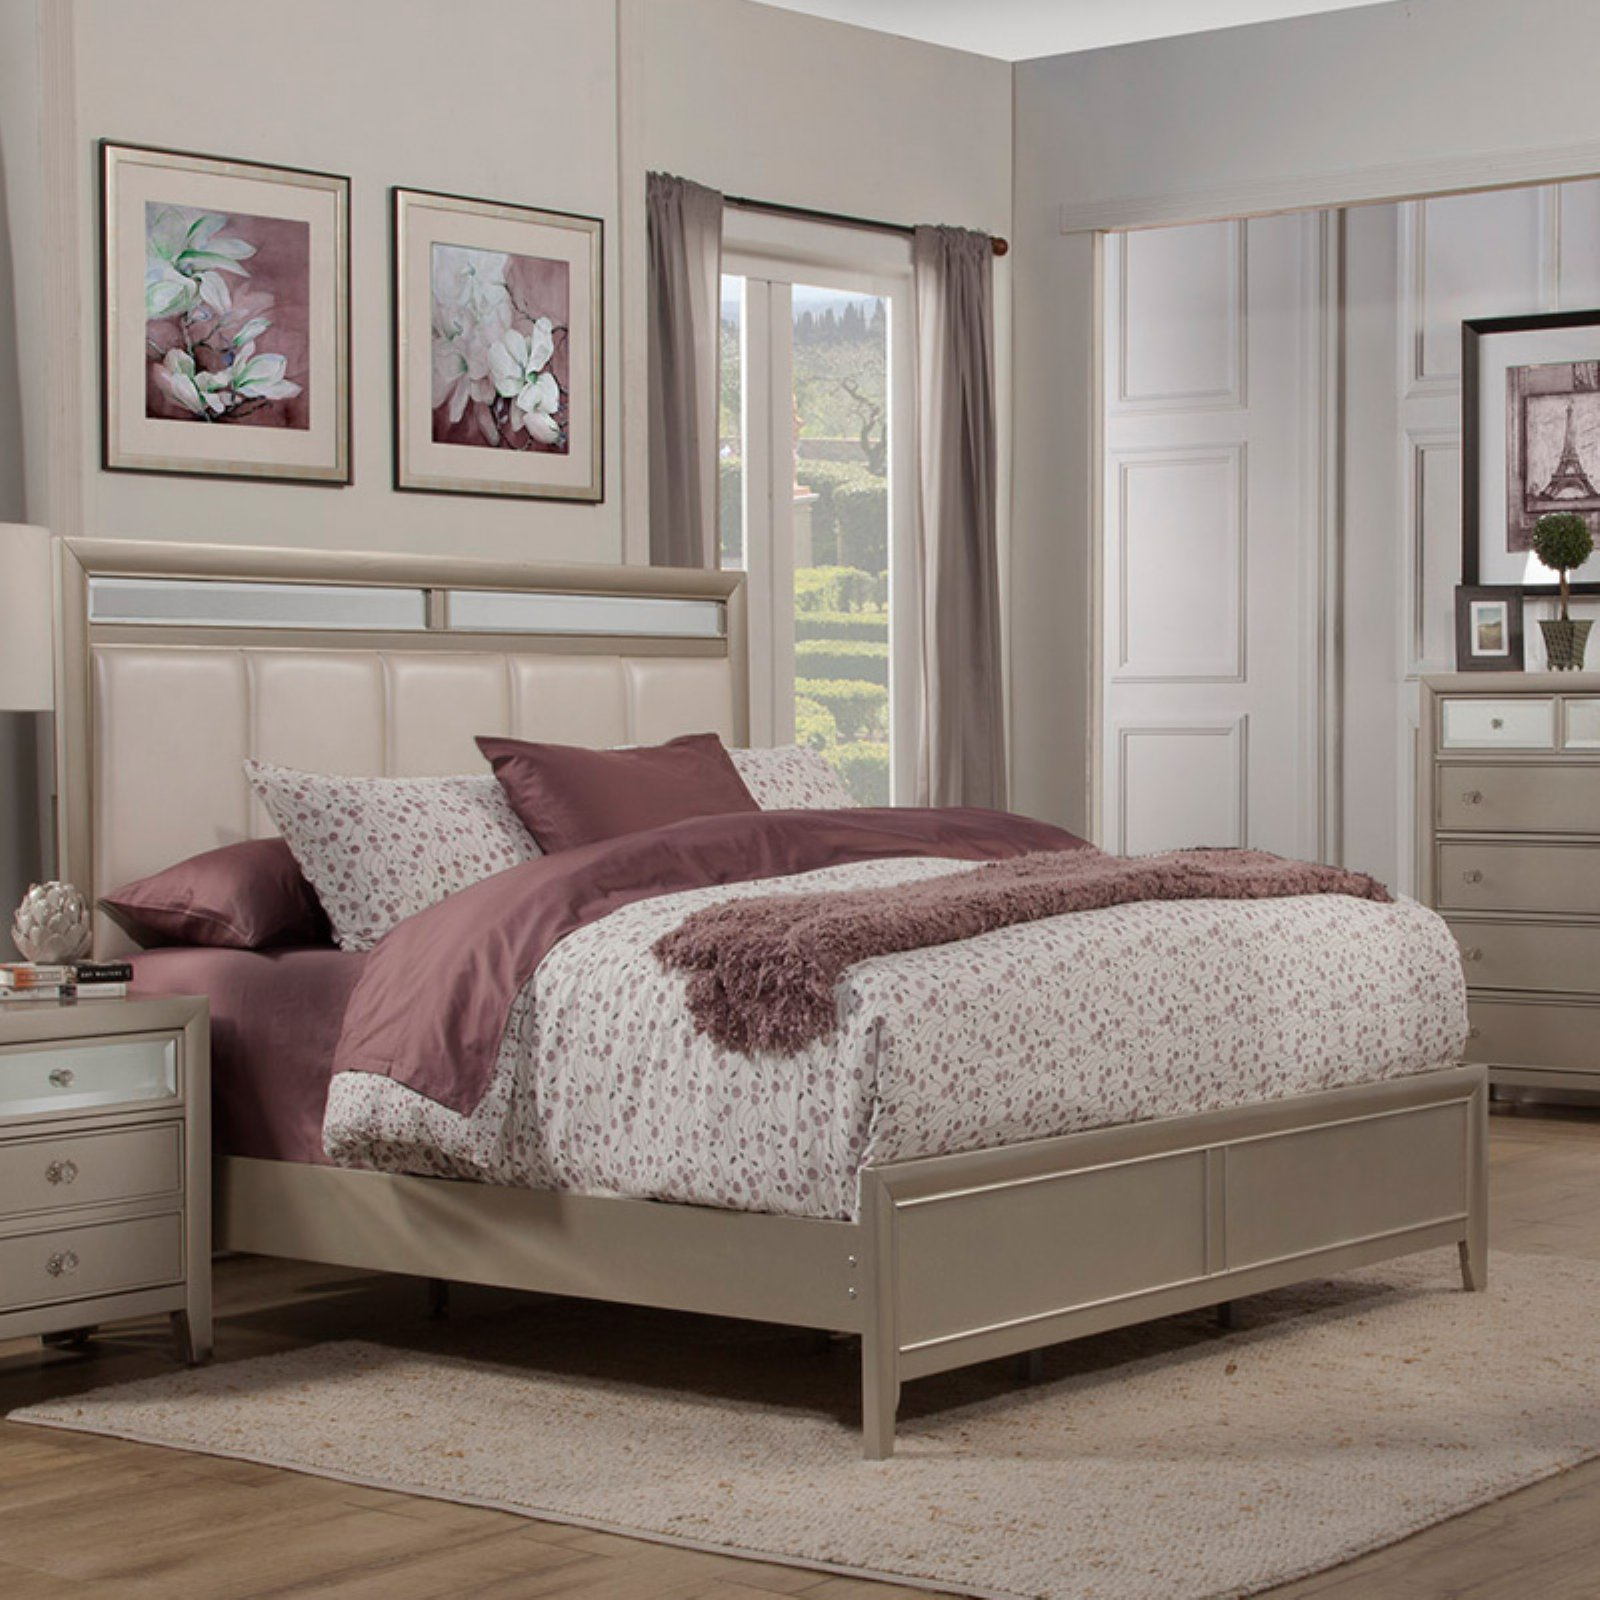 Alpine Furniture Silver Dreams Upholstered Panel Bed